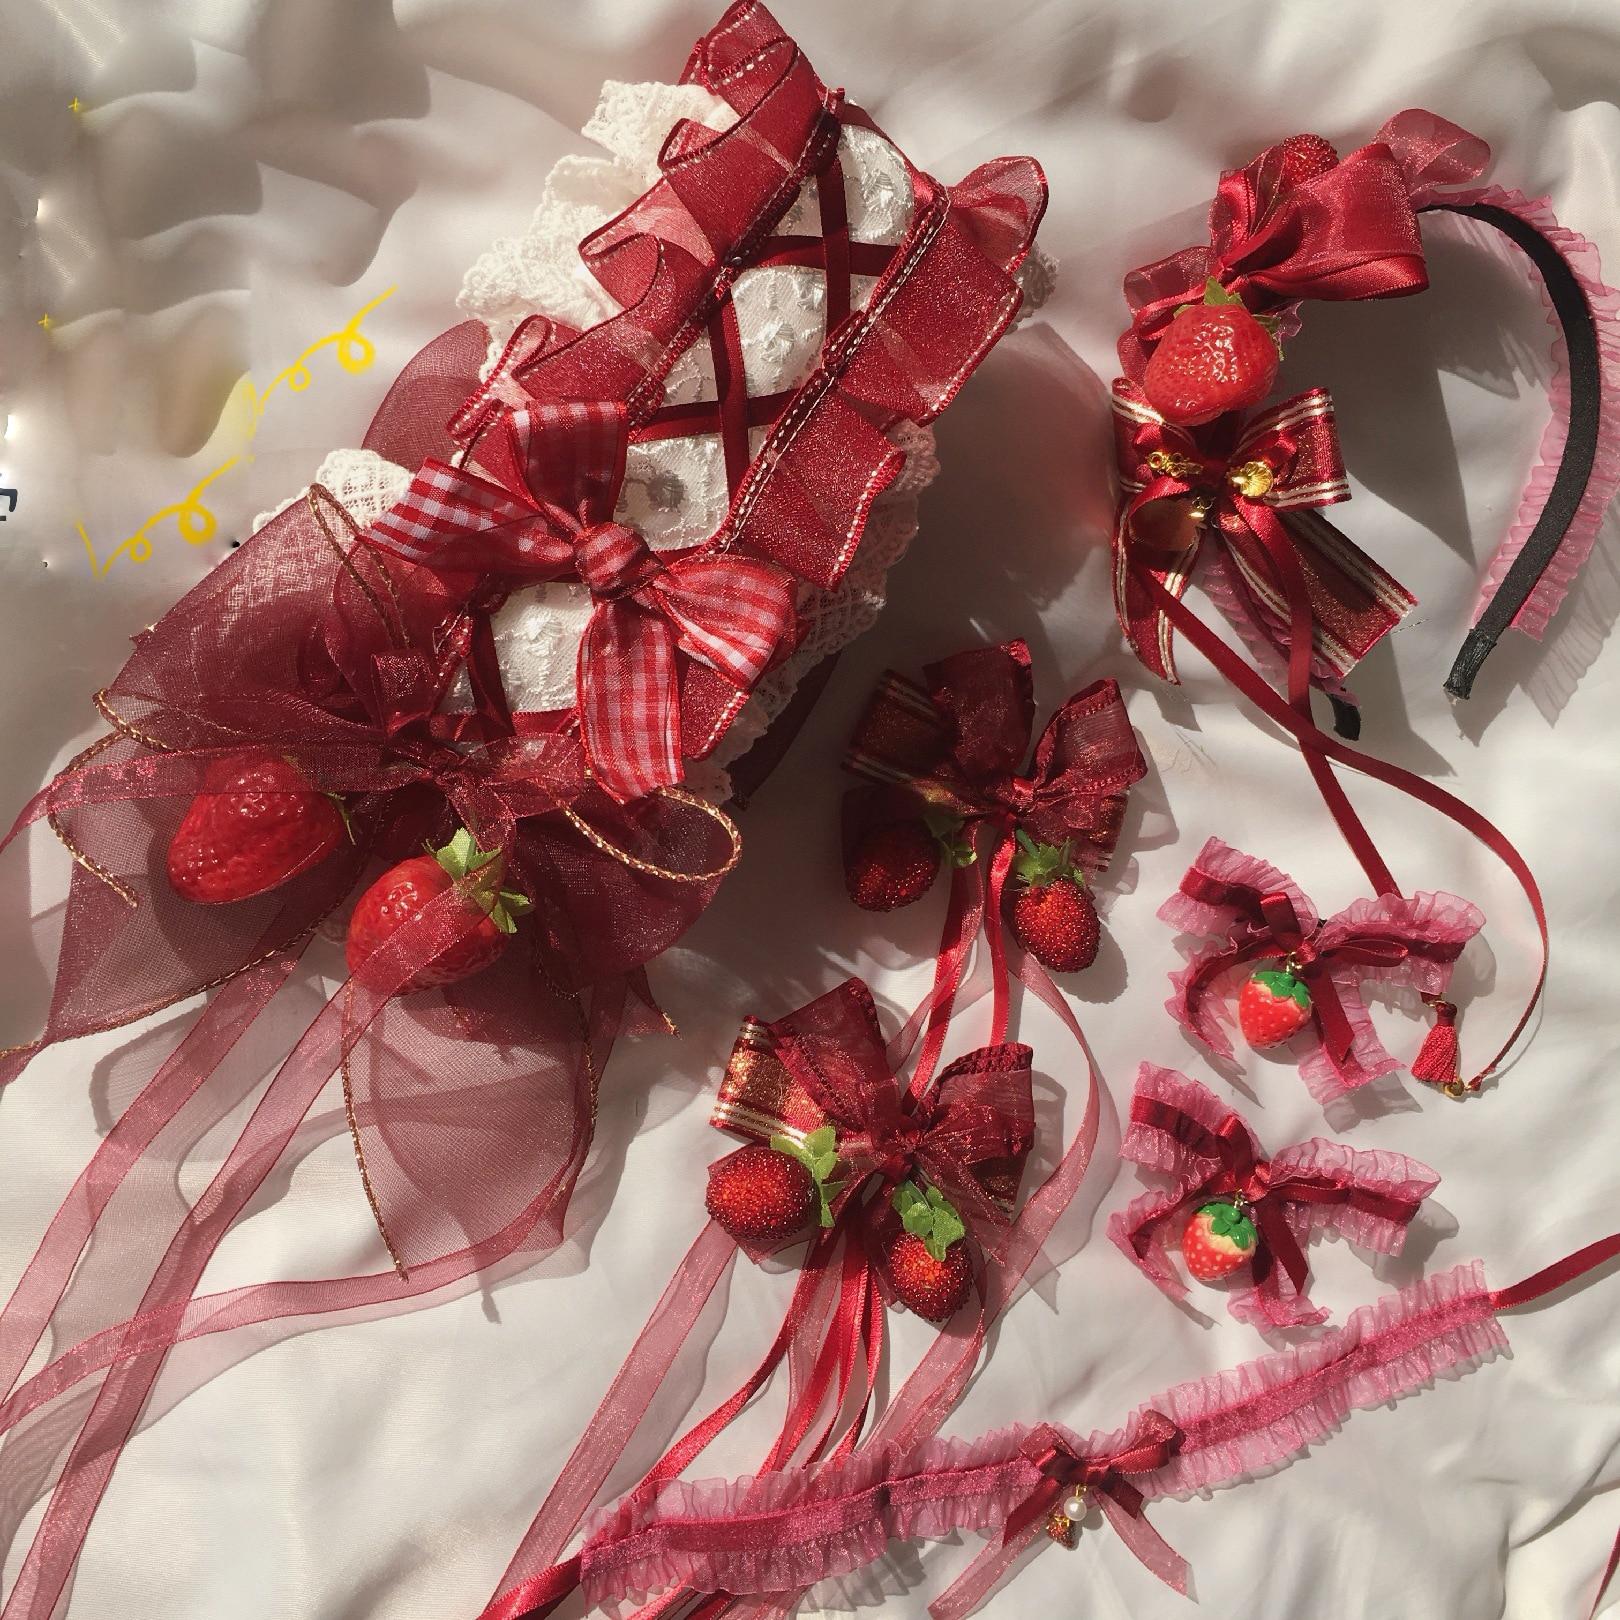 Dulce Lolita fresa Jam KC horquilla suave chica lazo japonés encaje diadema KC accesorios para el cabello